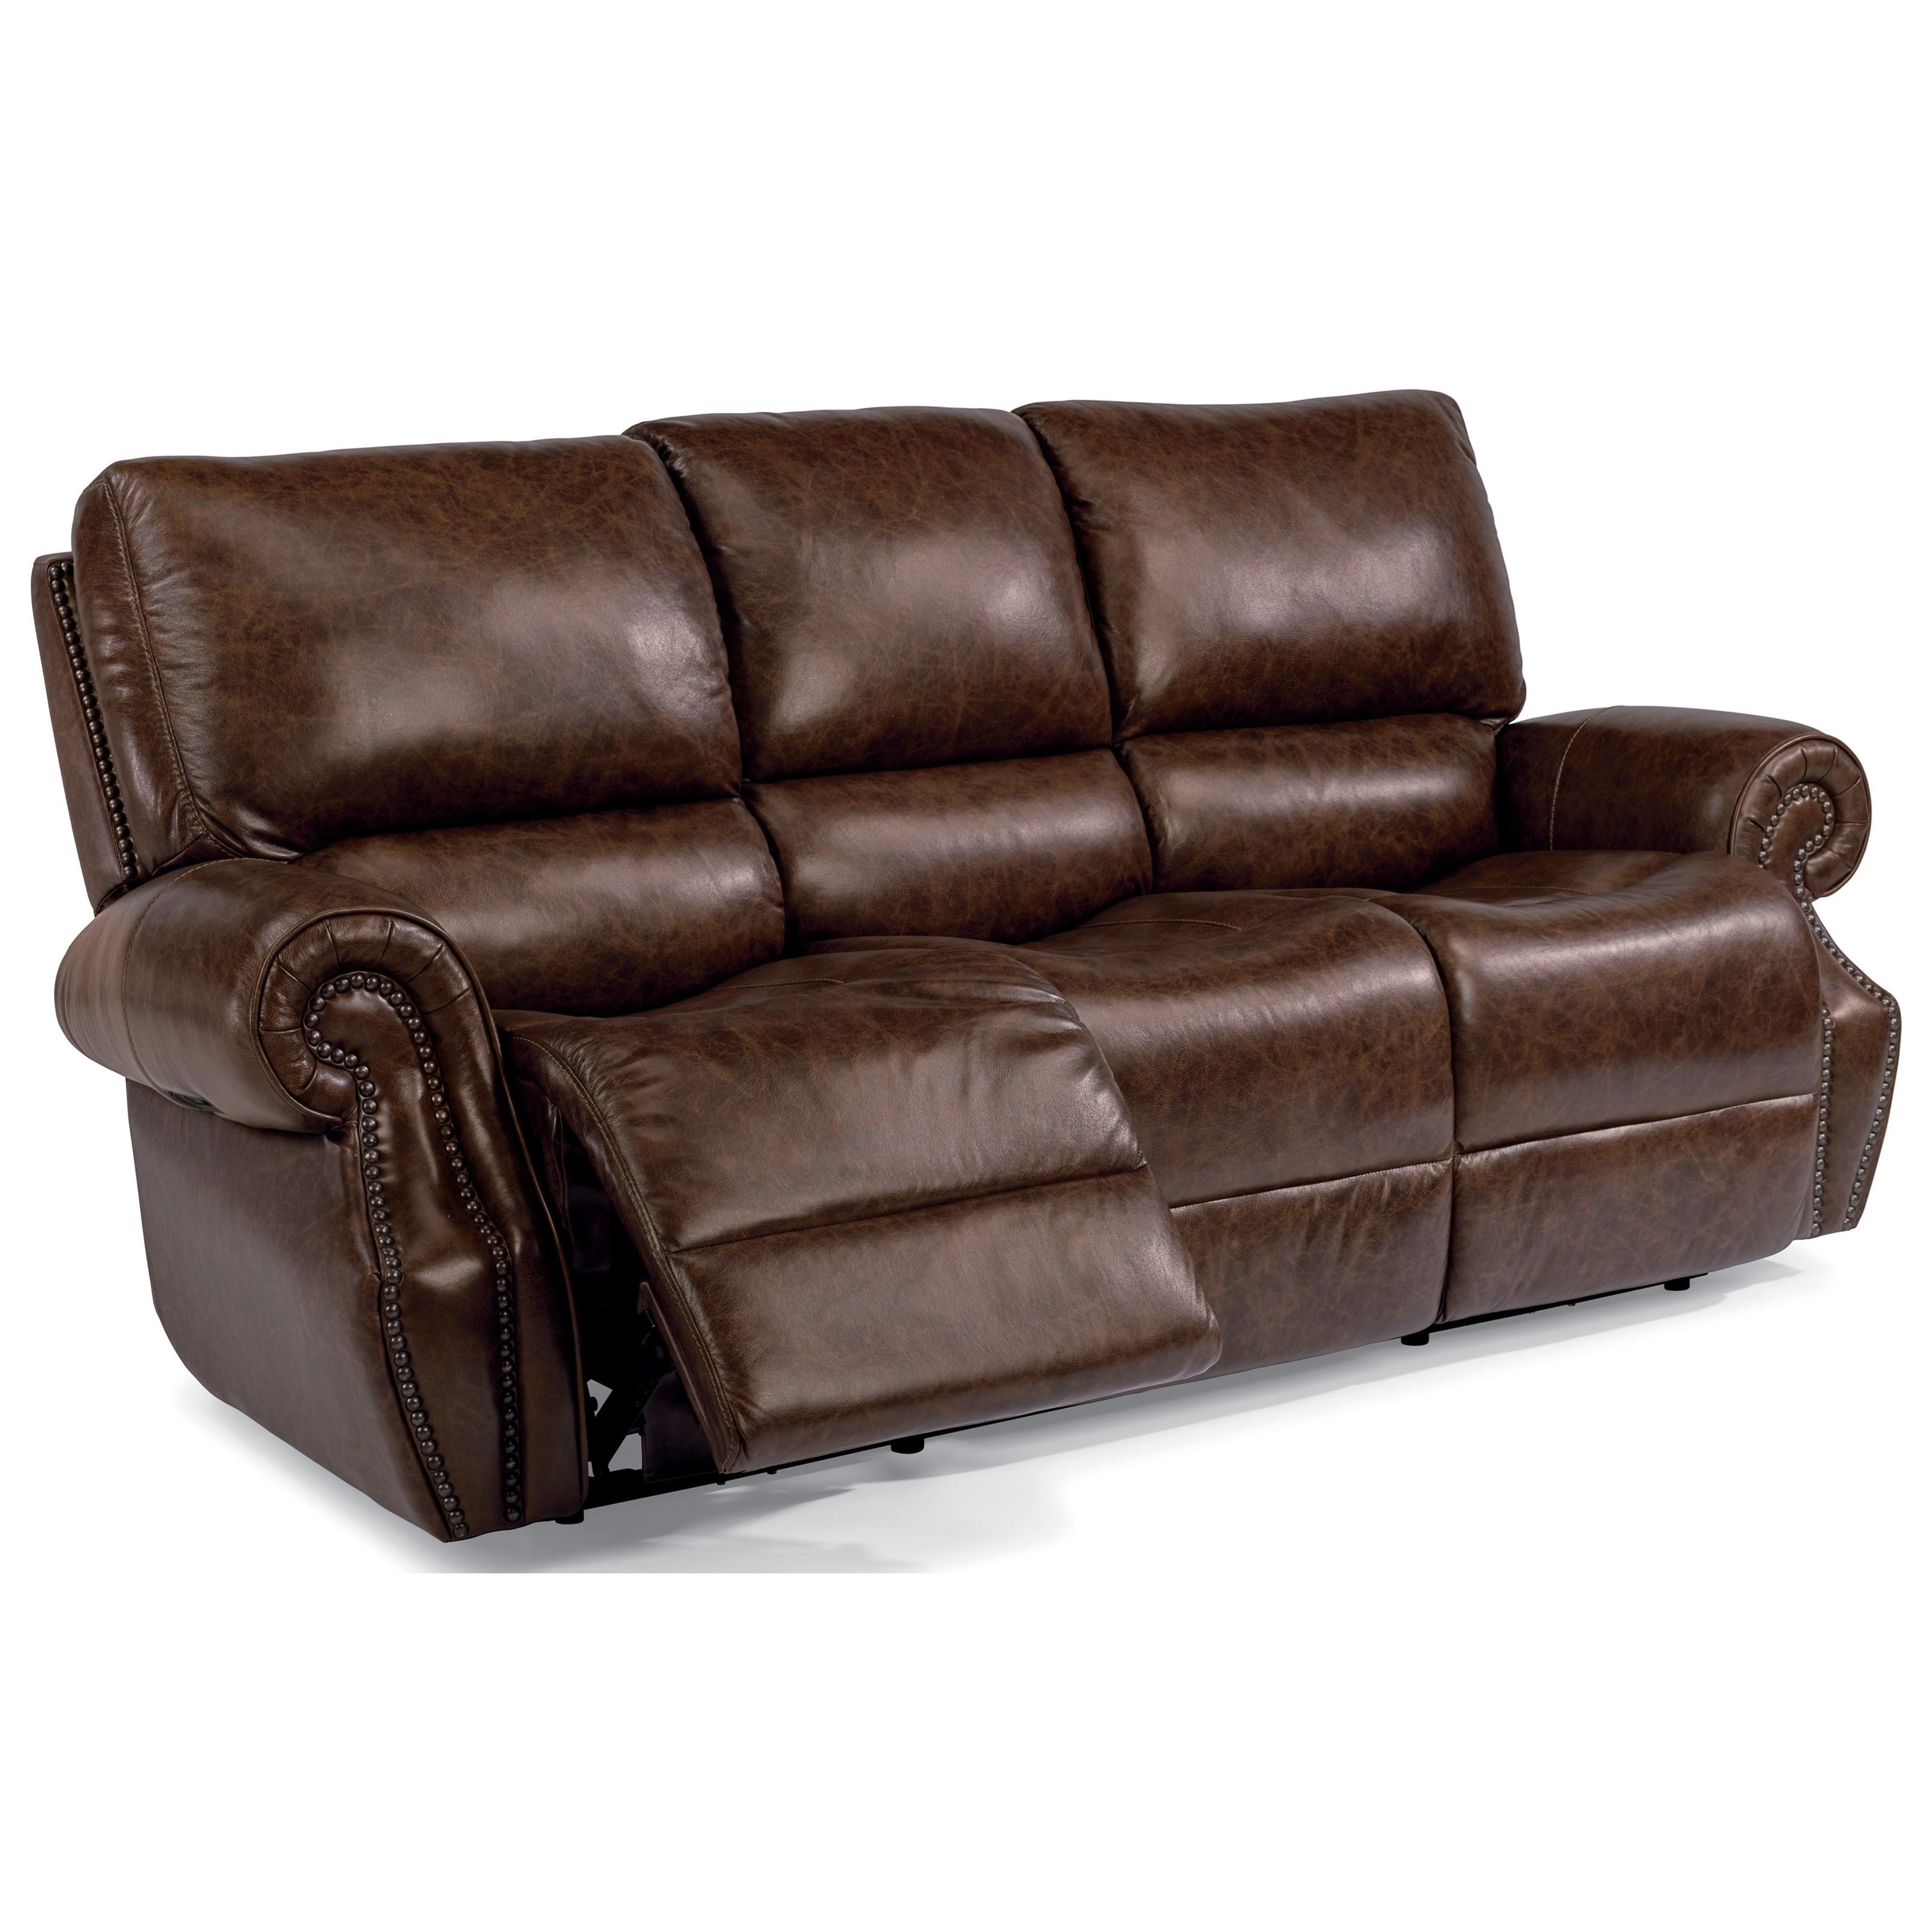 Flexsteel Latitudes-Colton Power Rcl Sofa w/ Pwr Headrest - Item Number: 1583-62PH